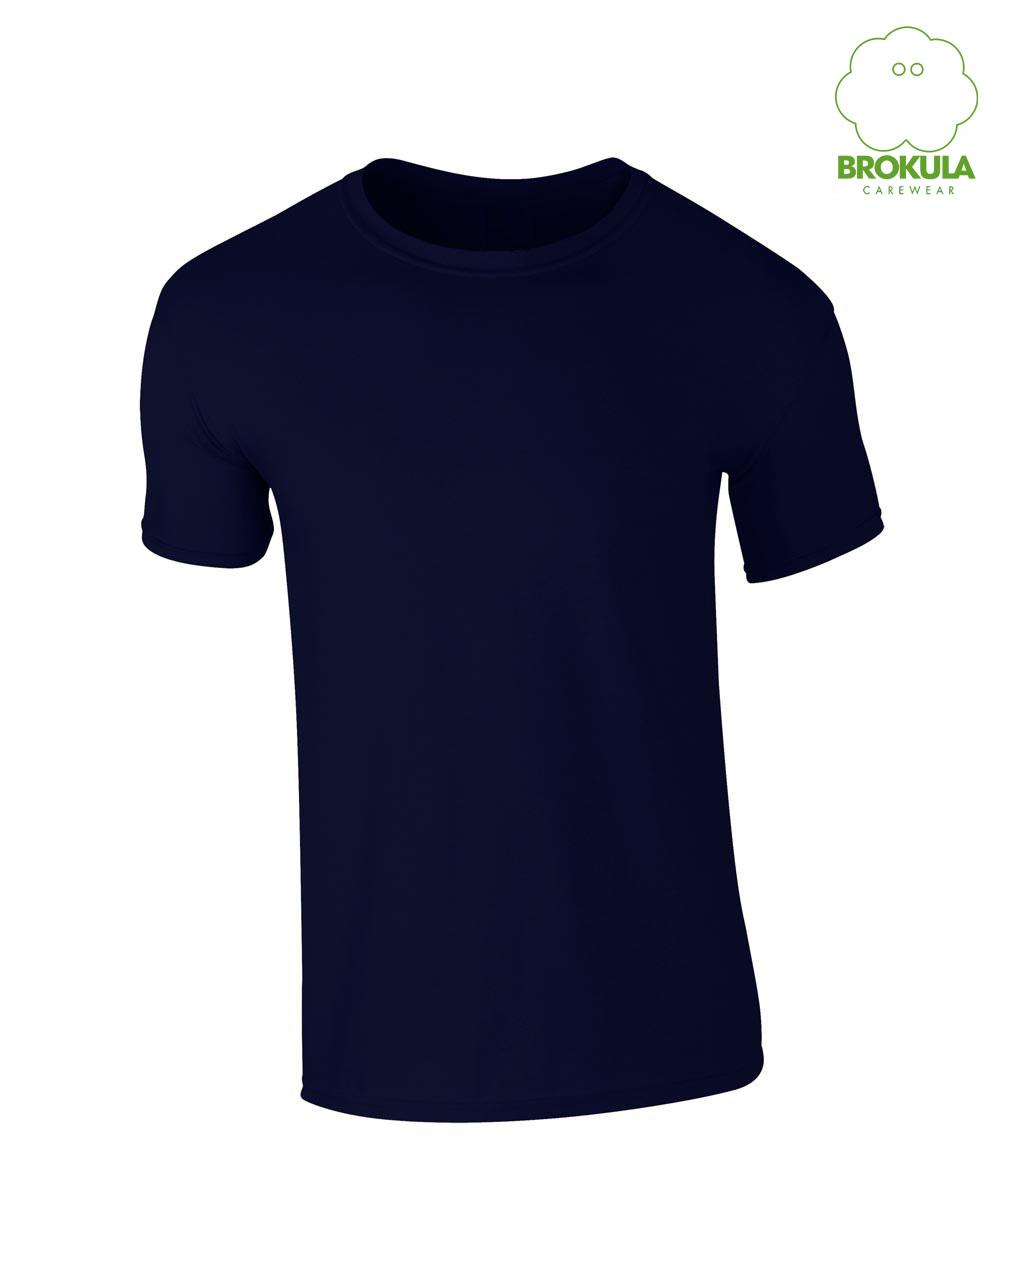 Muška T-shirt majica kratki rukav BROKULA organic line tamnoplava